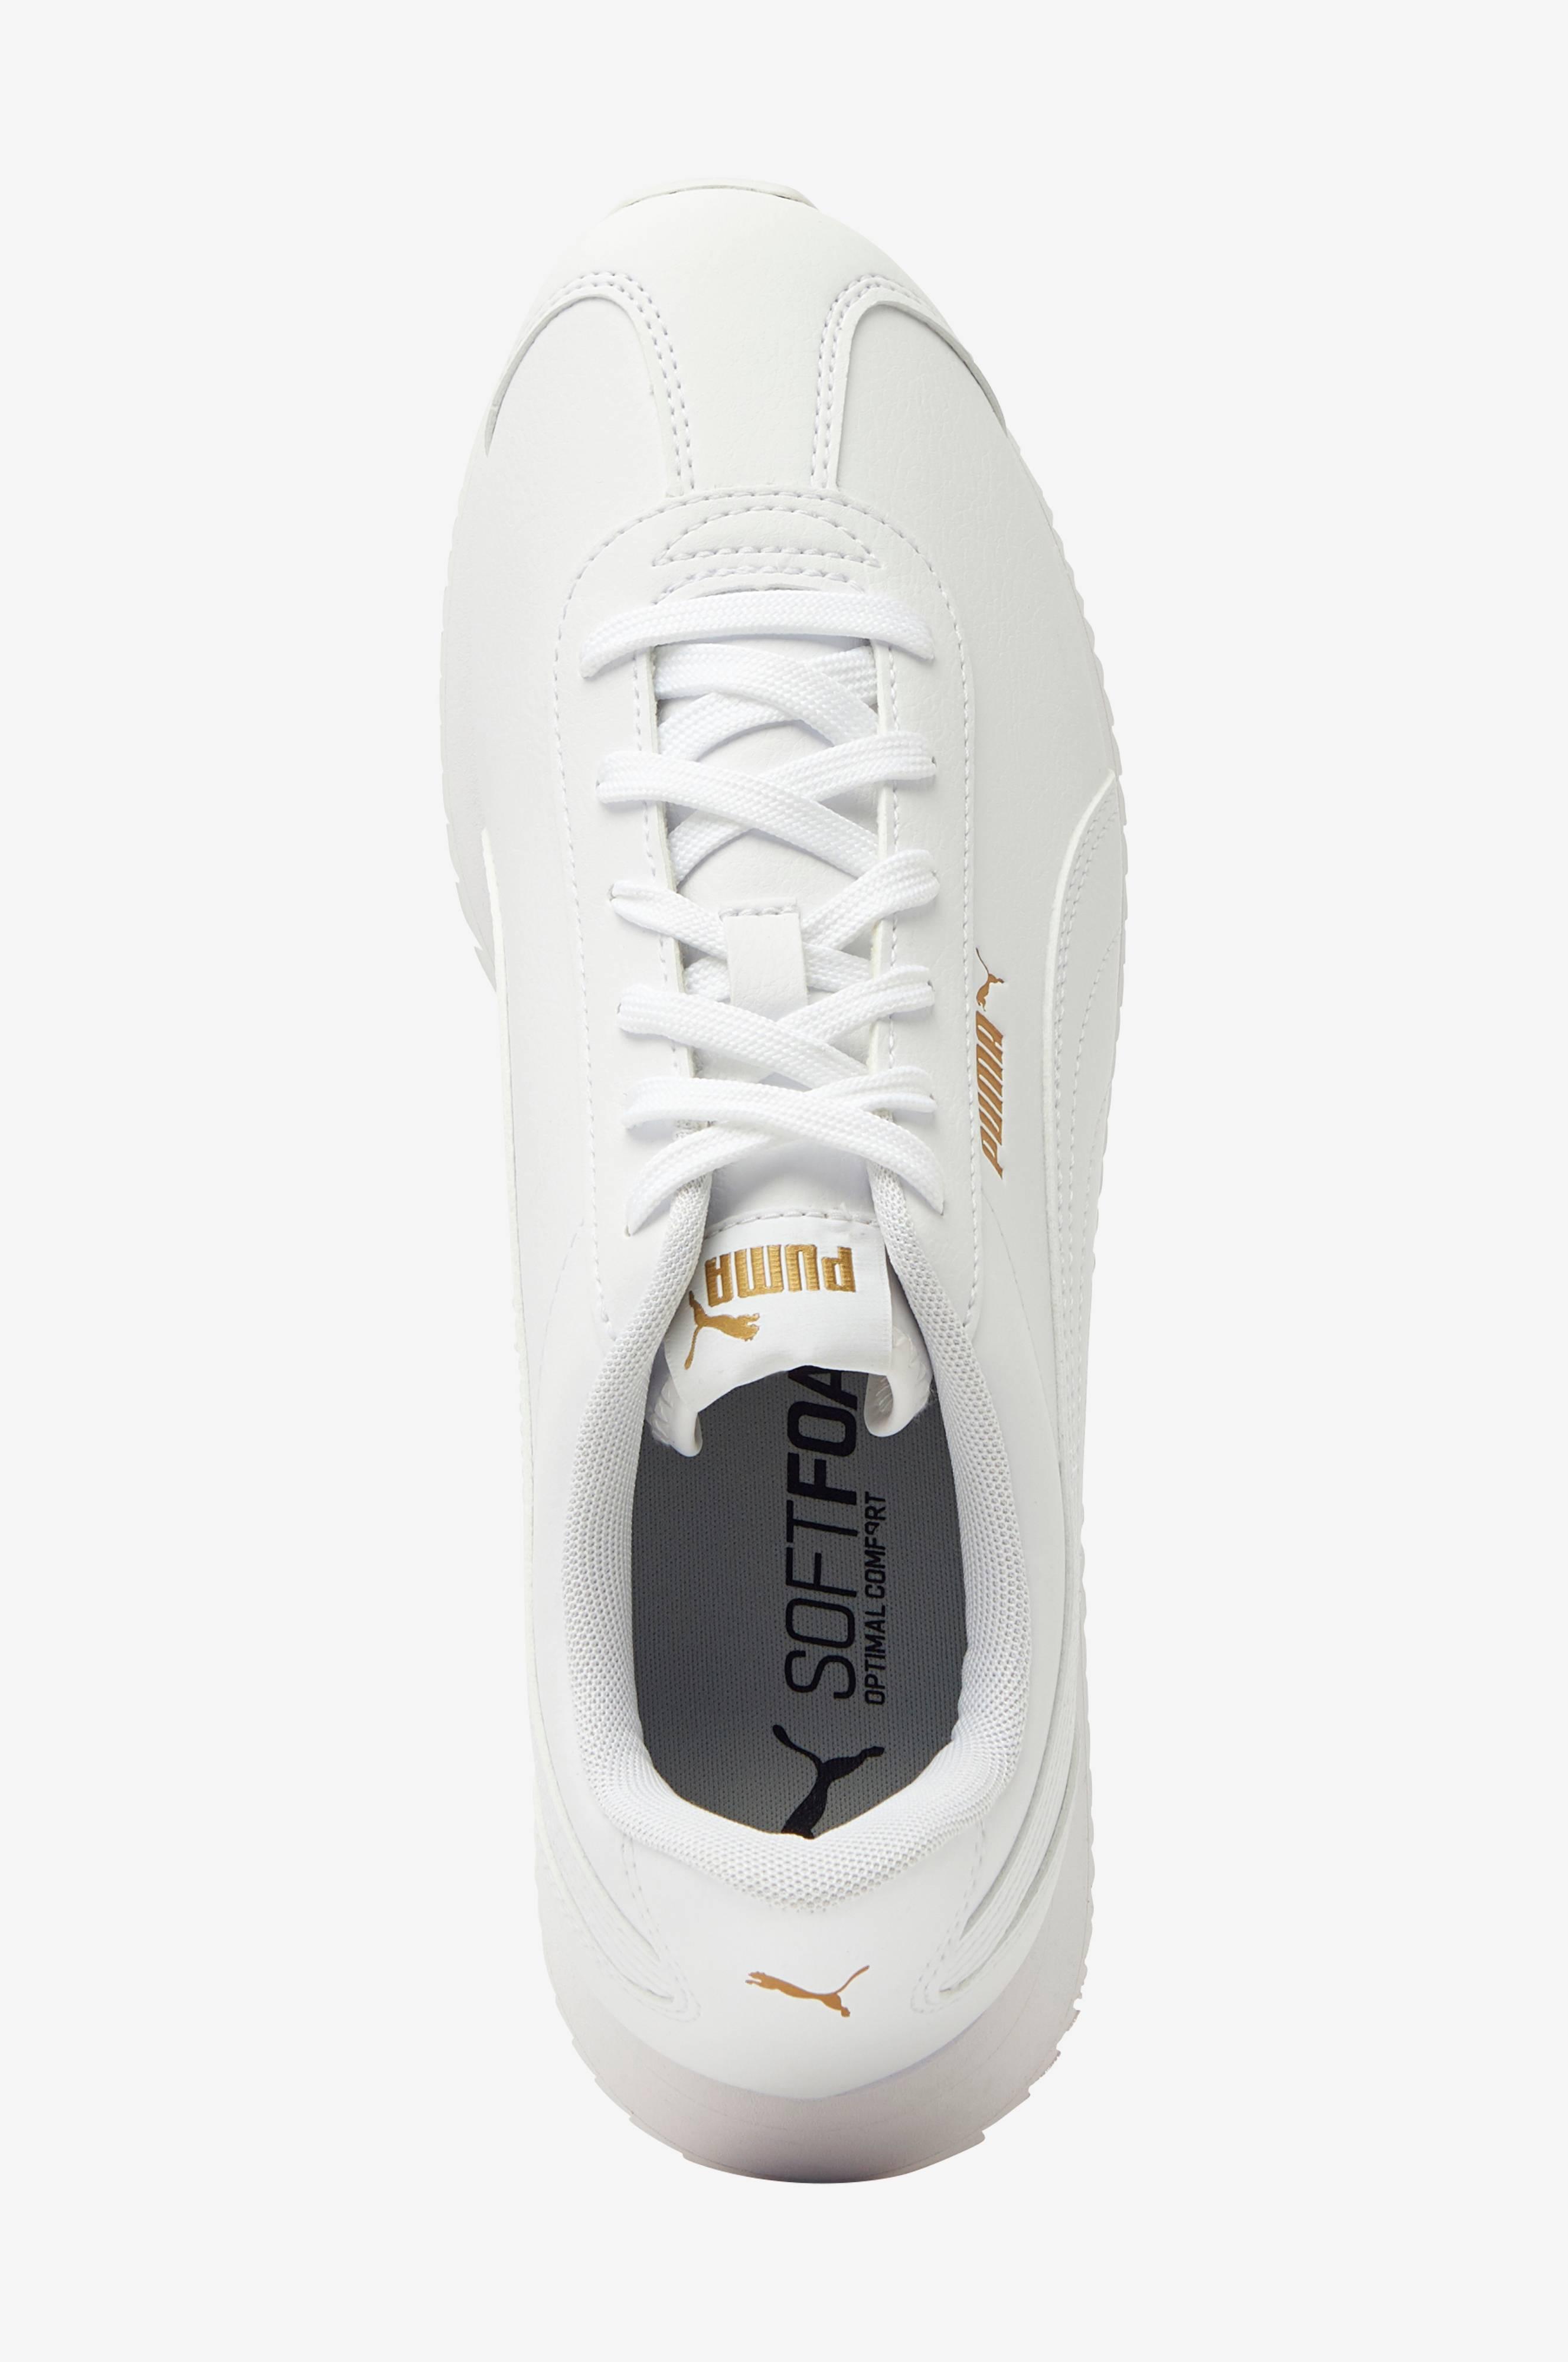 Puma Sneakers Turino Stacked Hvid Dame Ellos.dk